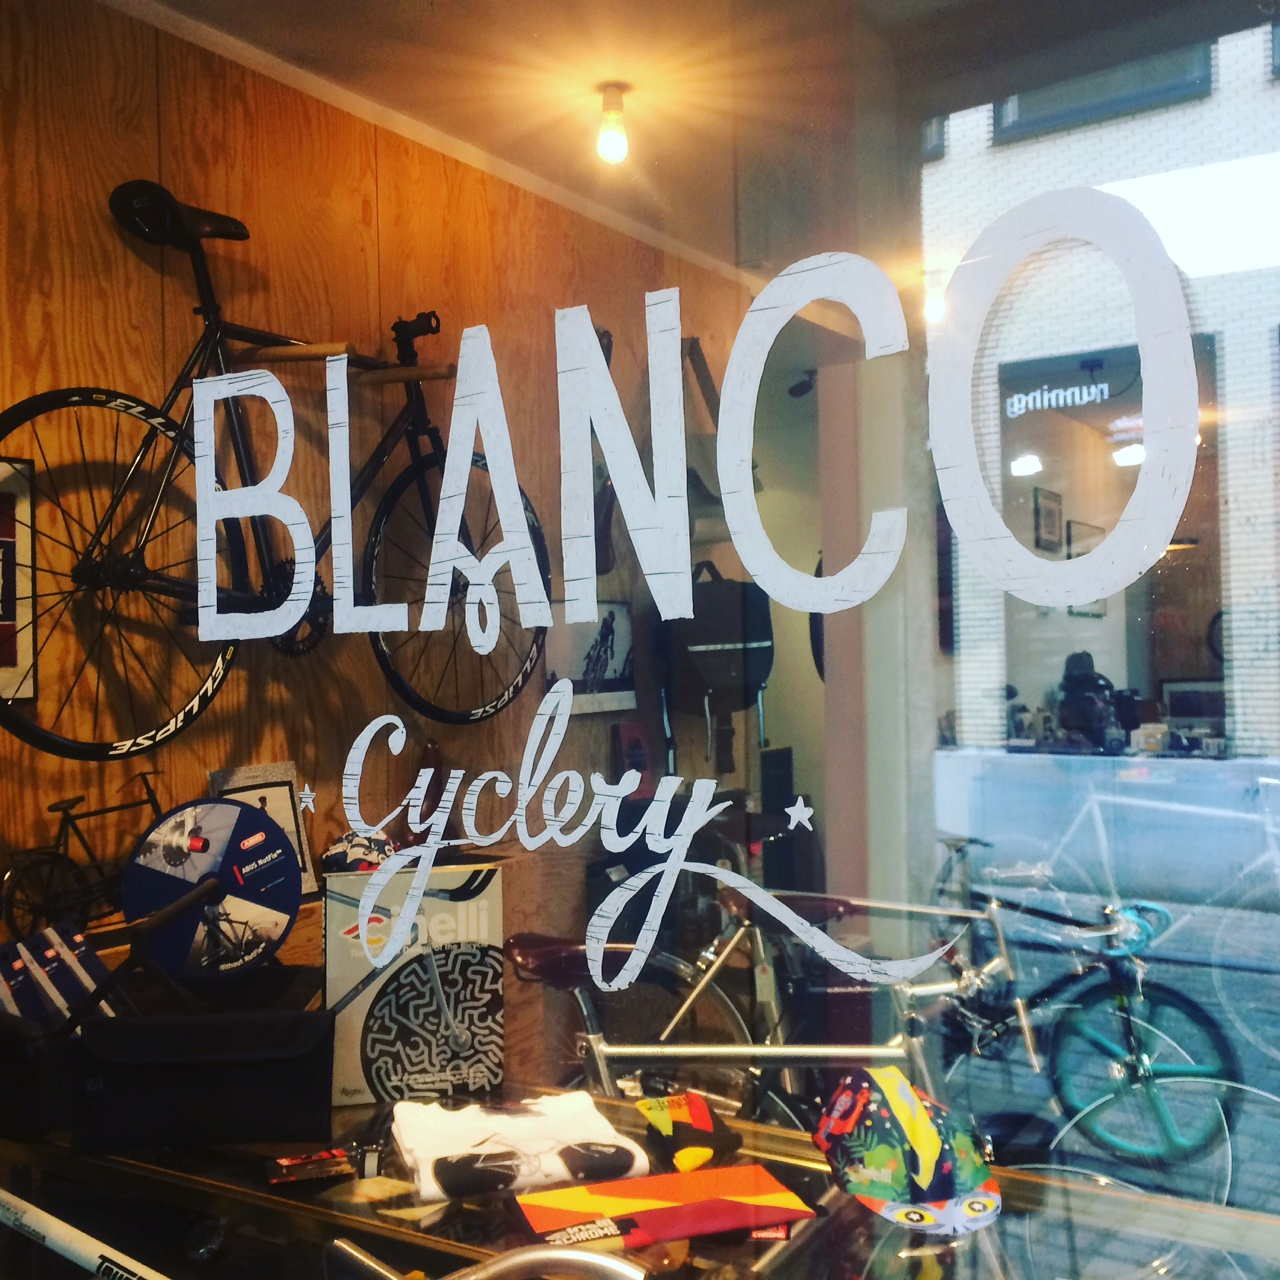 GHENT - BLANCO BIKE LUXURYBendesteeg 199000 Gentwww.blancobikeluxury.beOpen wednesday - saturday (10:30 - 18:30)Monday (13:00 - 18:00)Closed on tuesday